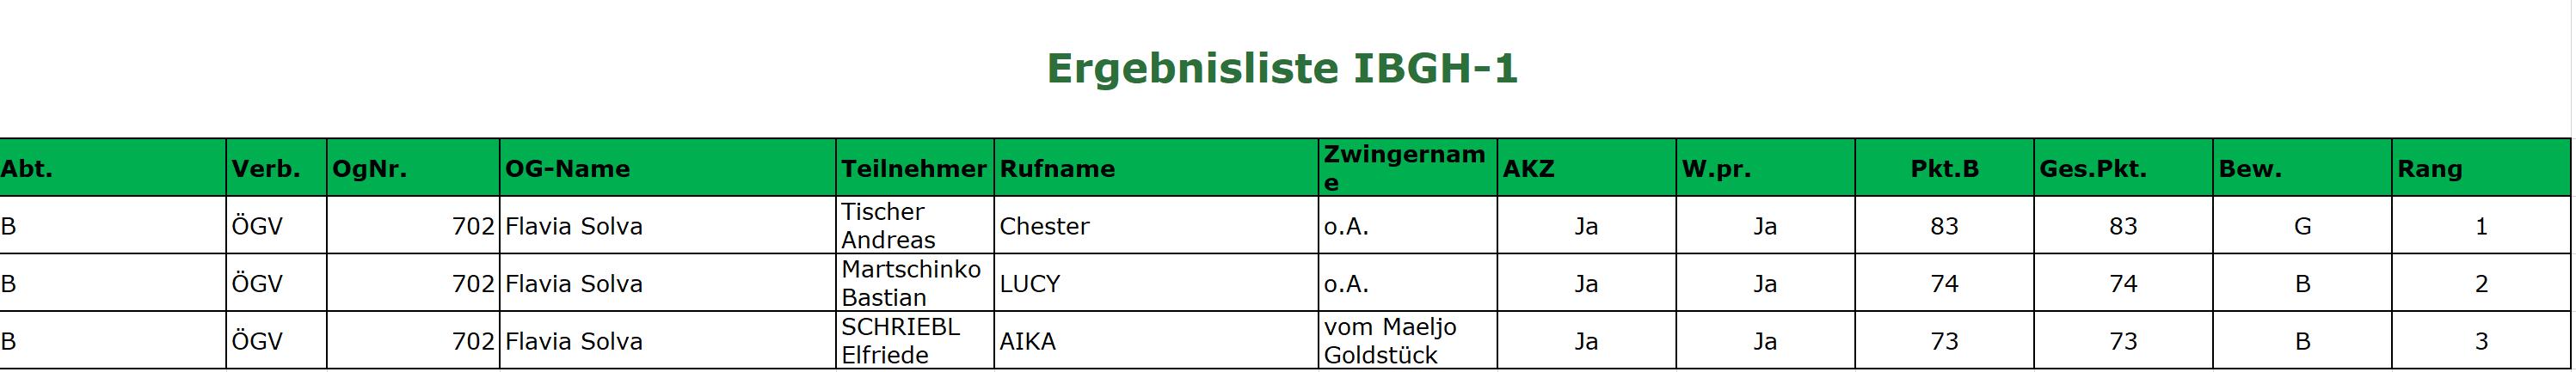 2019-11-27_Herbstprüfung 2019_IBGH1